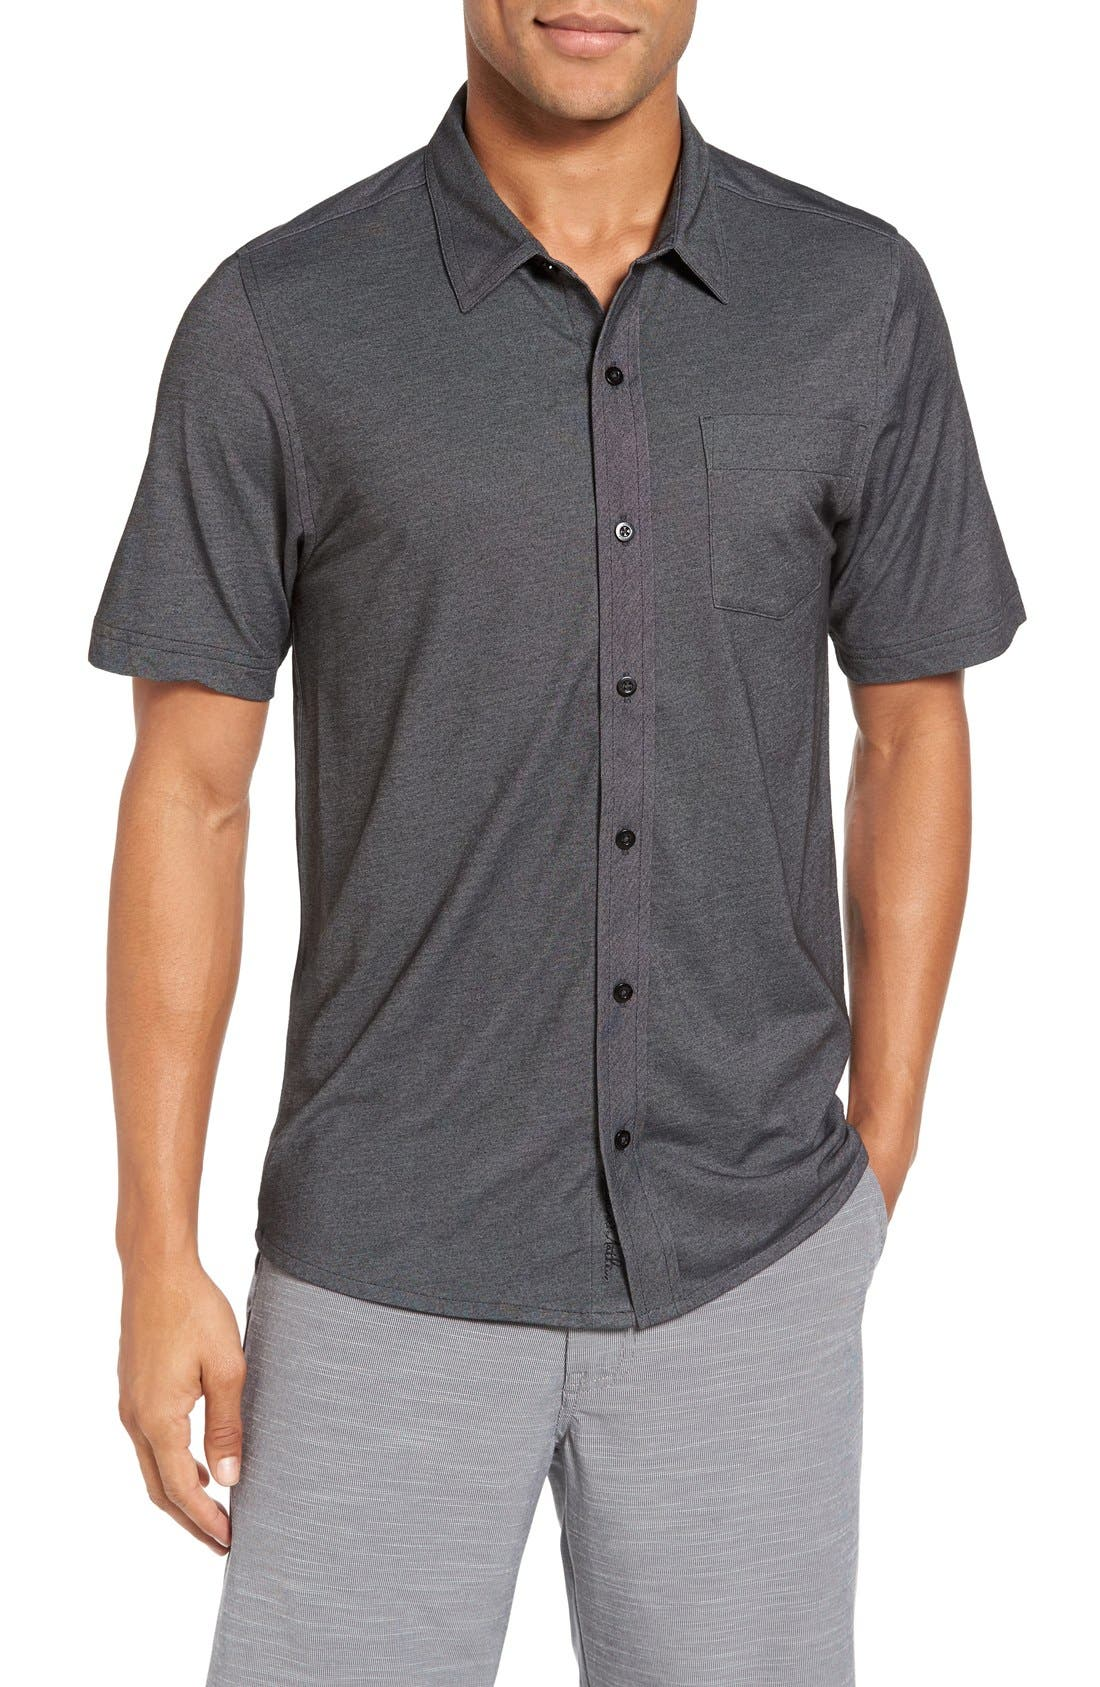 Alternate Image 1 Selected - Travis Mathew Hines Slim Fit Wrinkle Resistant Sport Shirt